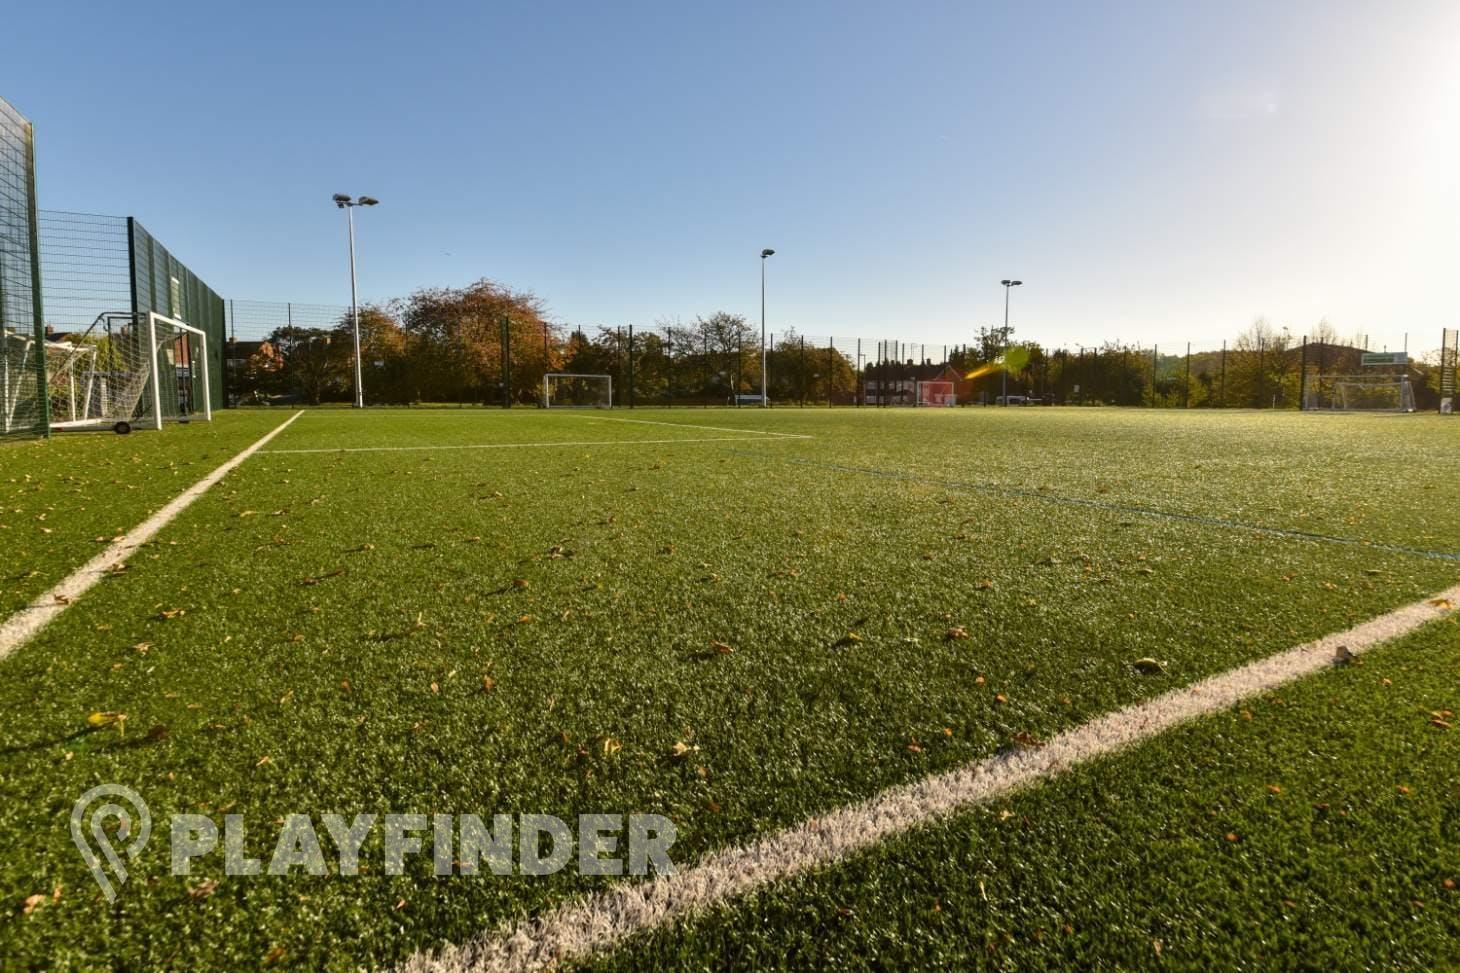 Meriden Community Centre 9 a side | 3G Astroturf football pitch